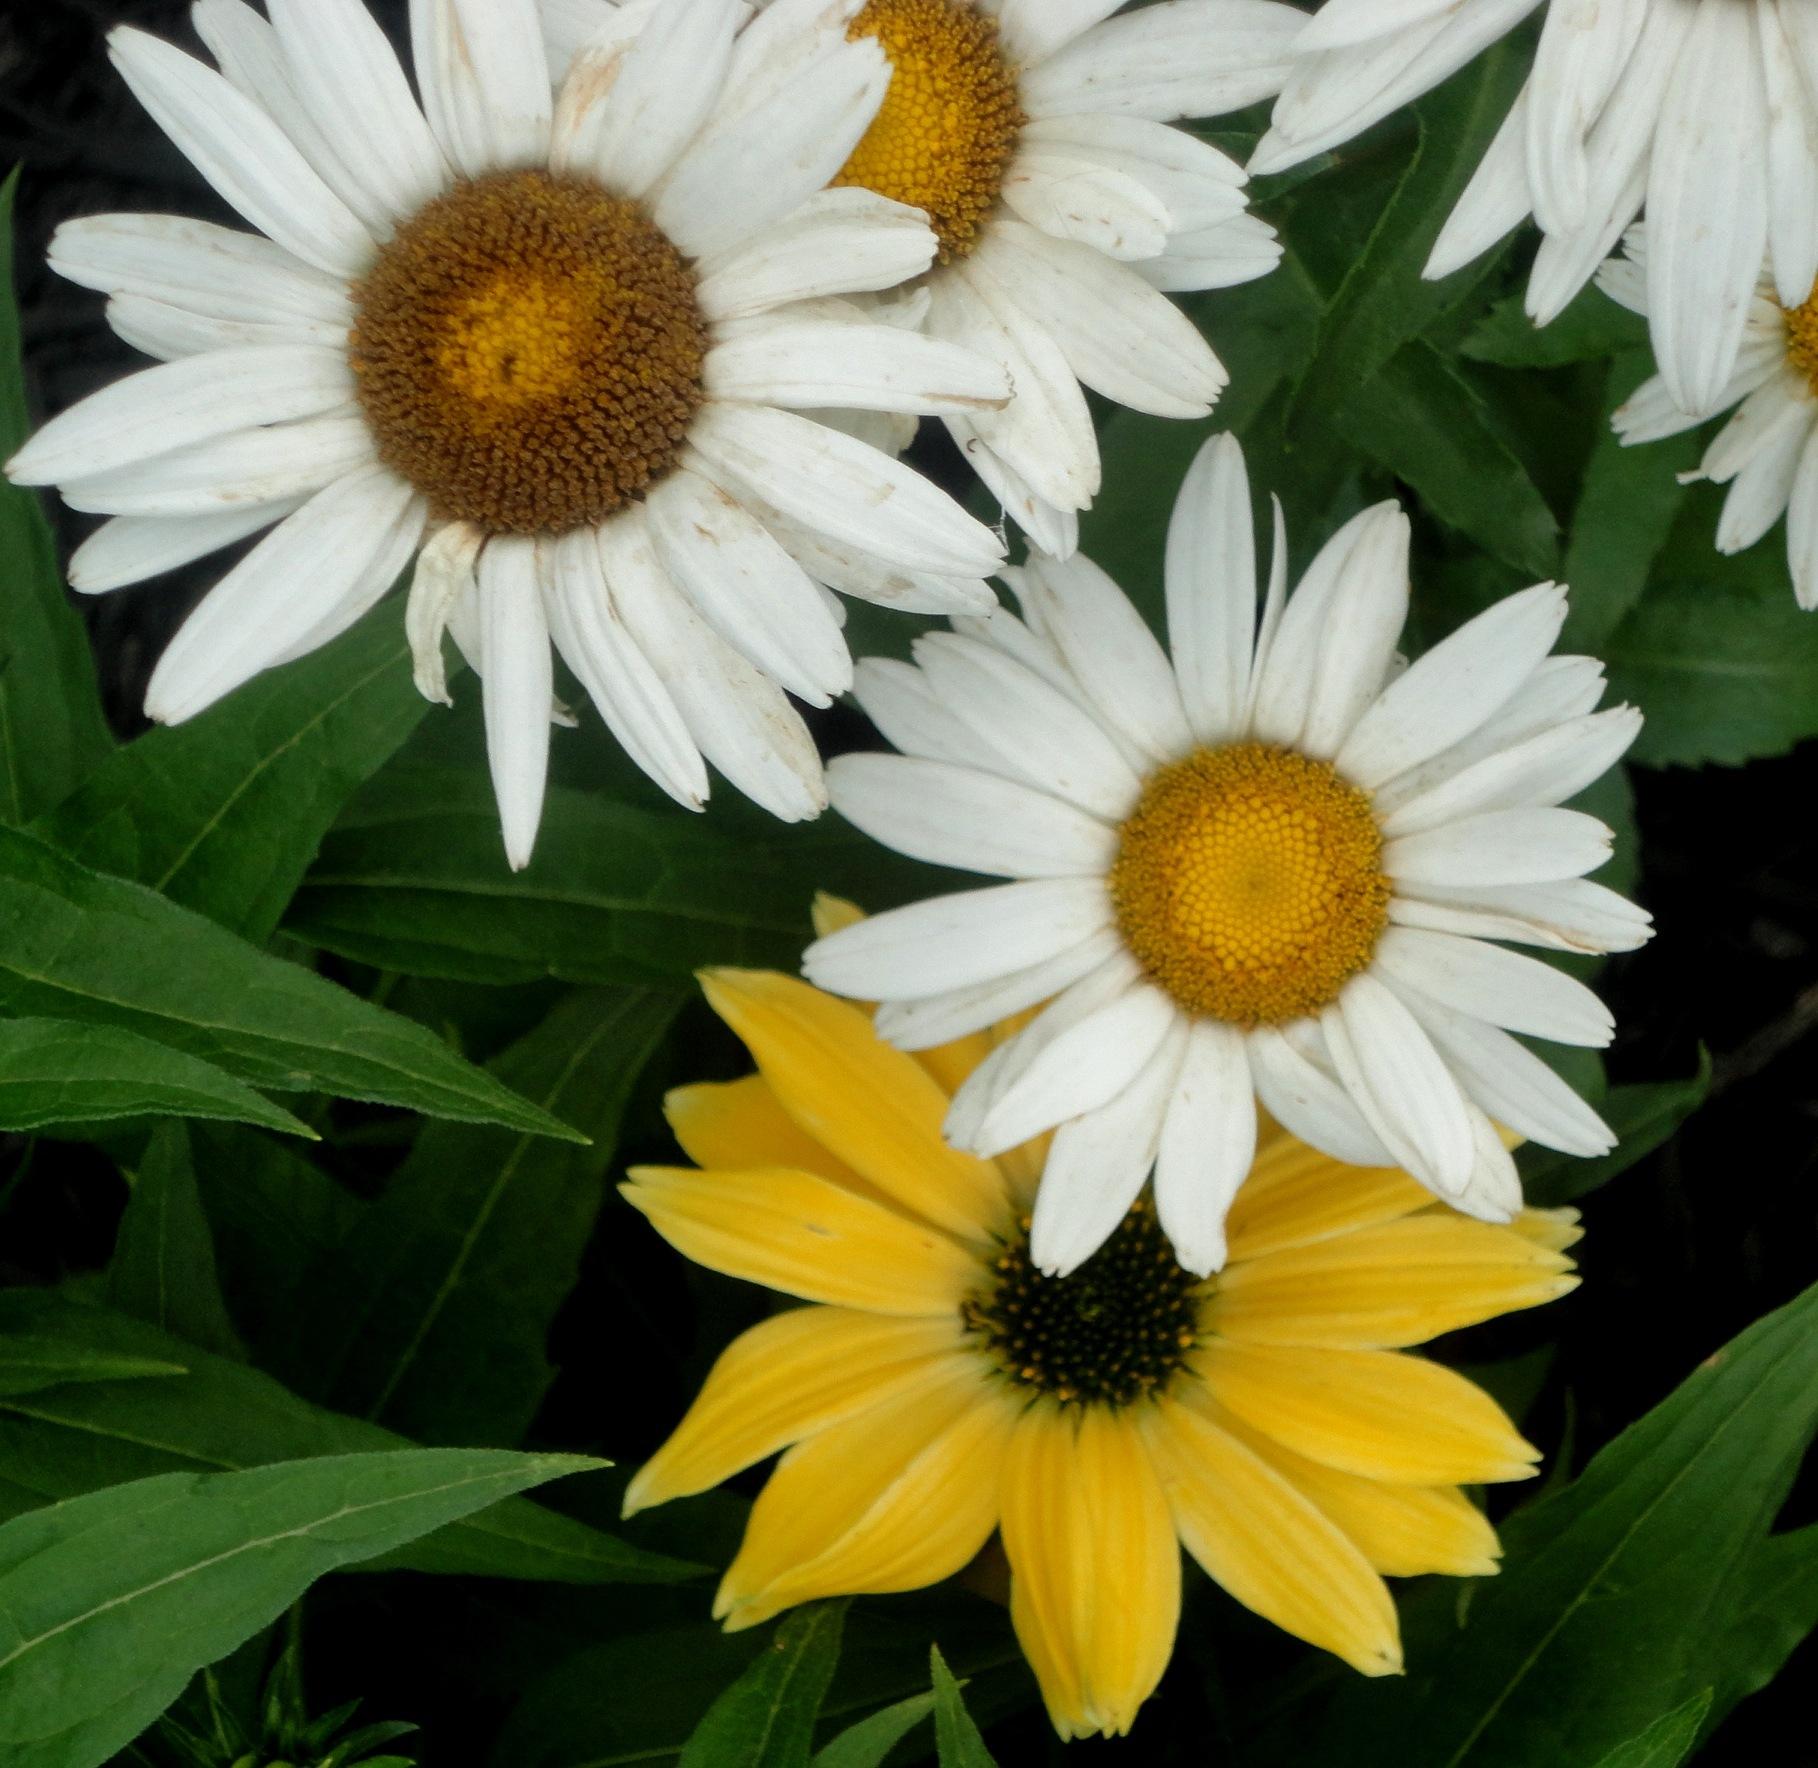 Yellow & White Daisies by nancy.mitchell3